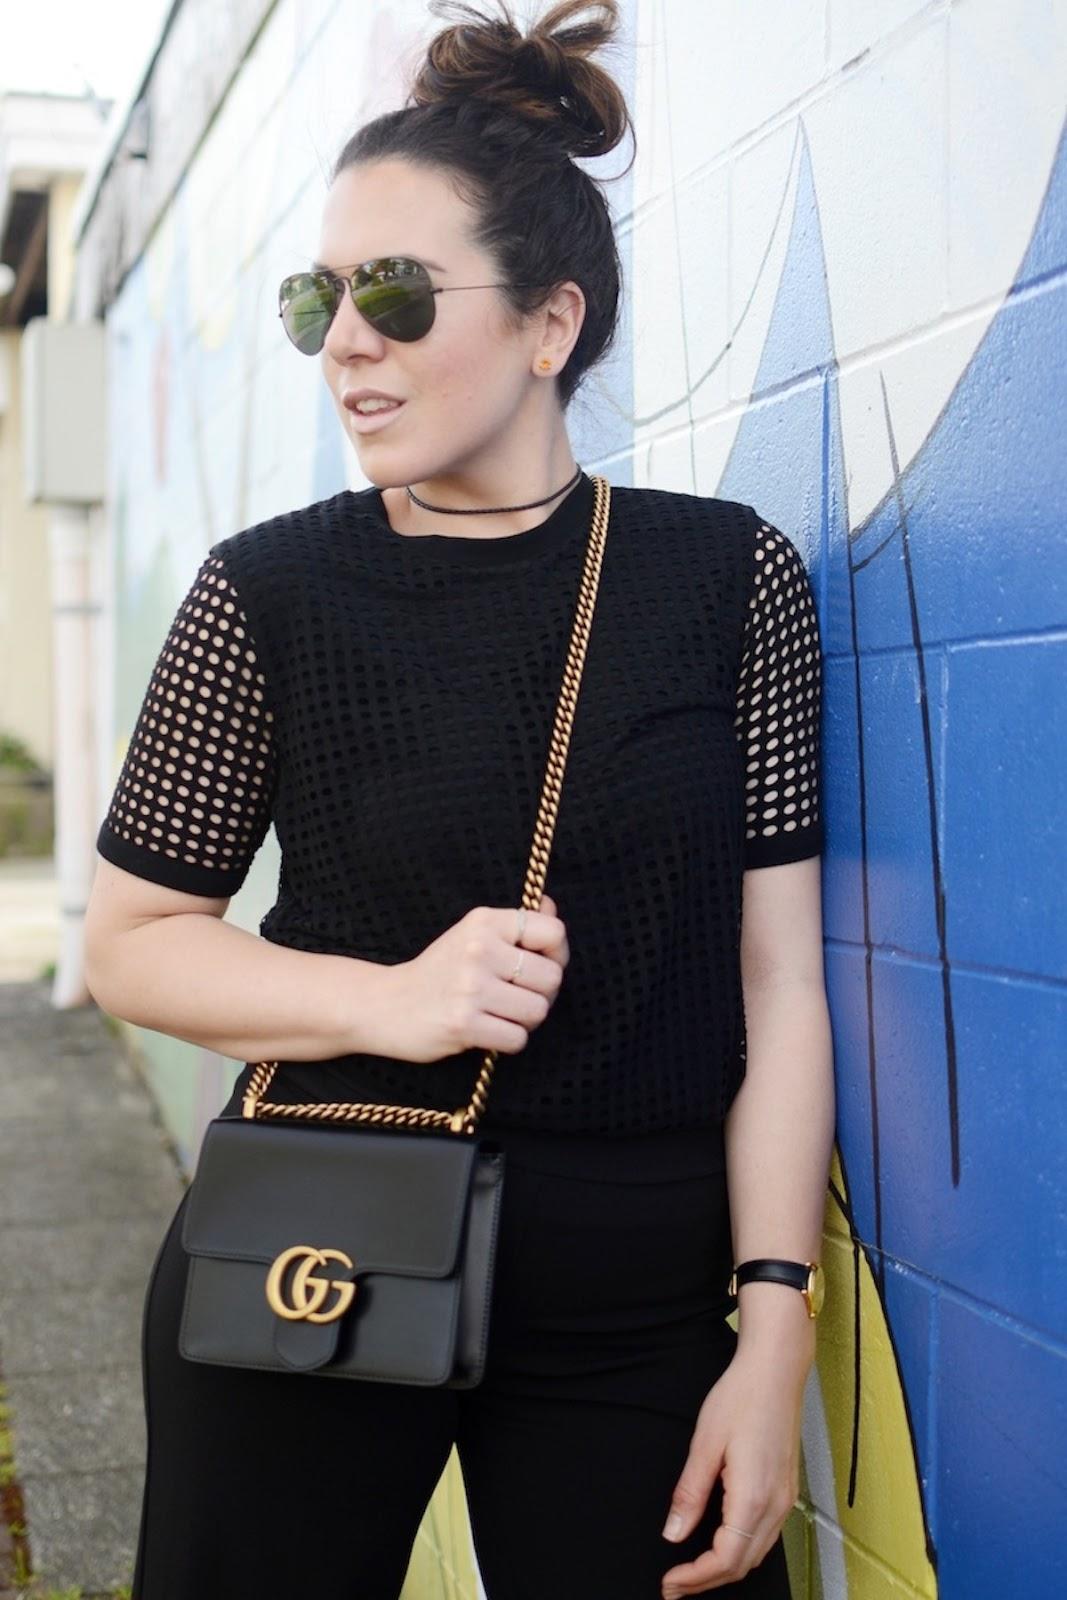 Bench mesh T shirt blogger vancouver le chateau culottes outfit